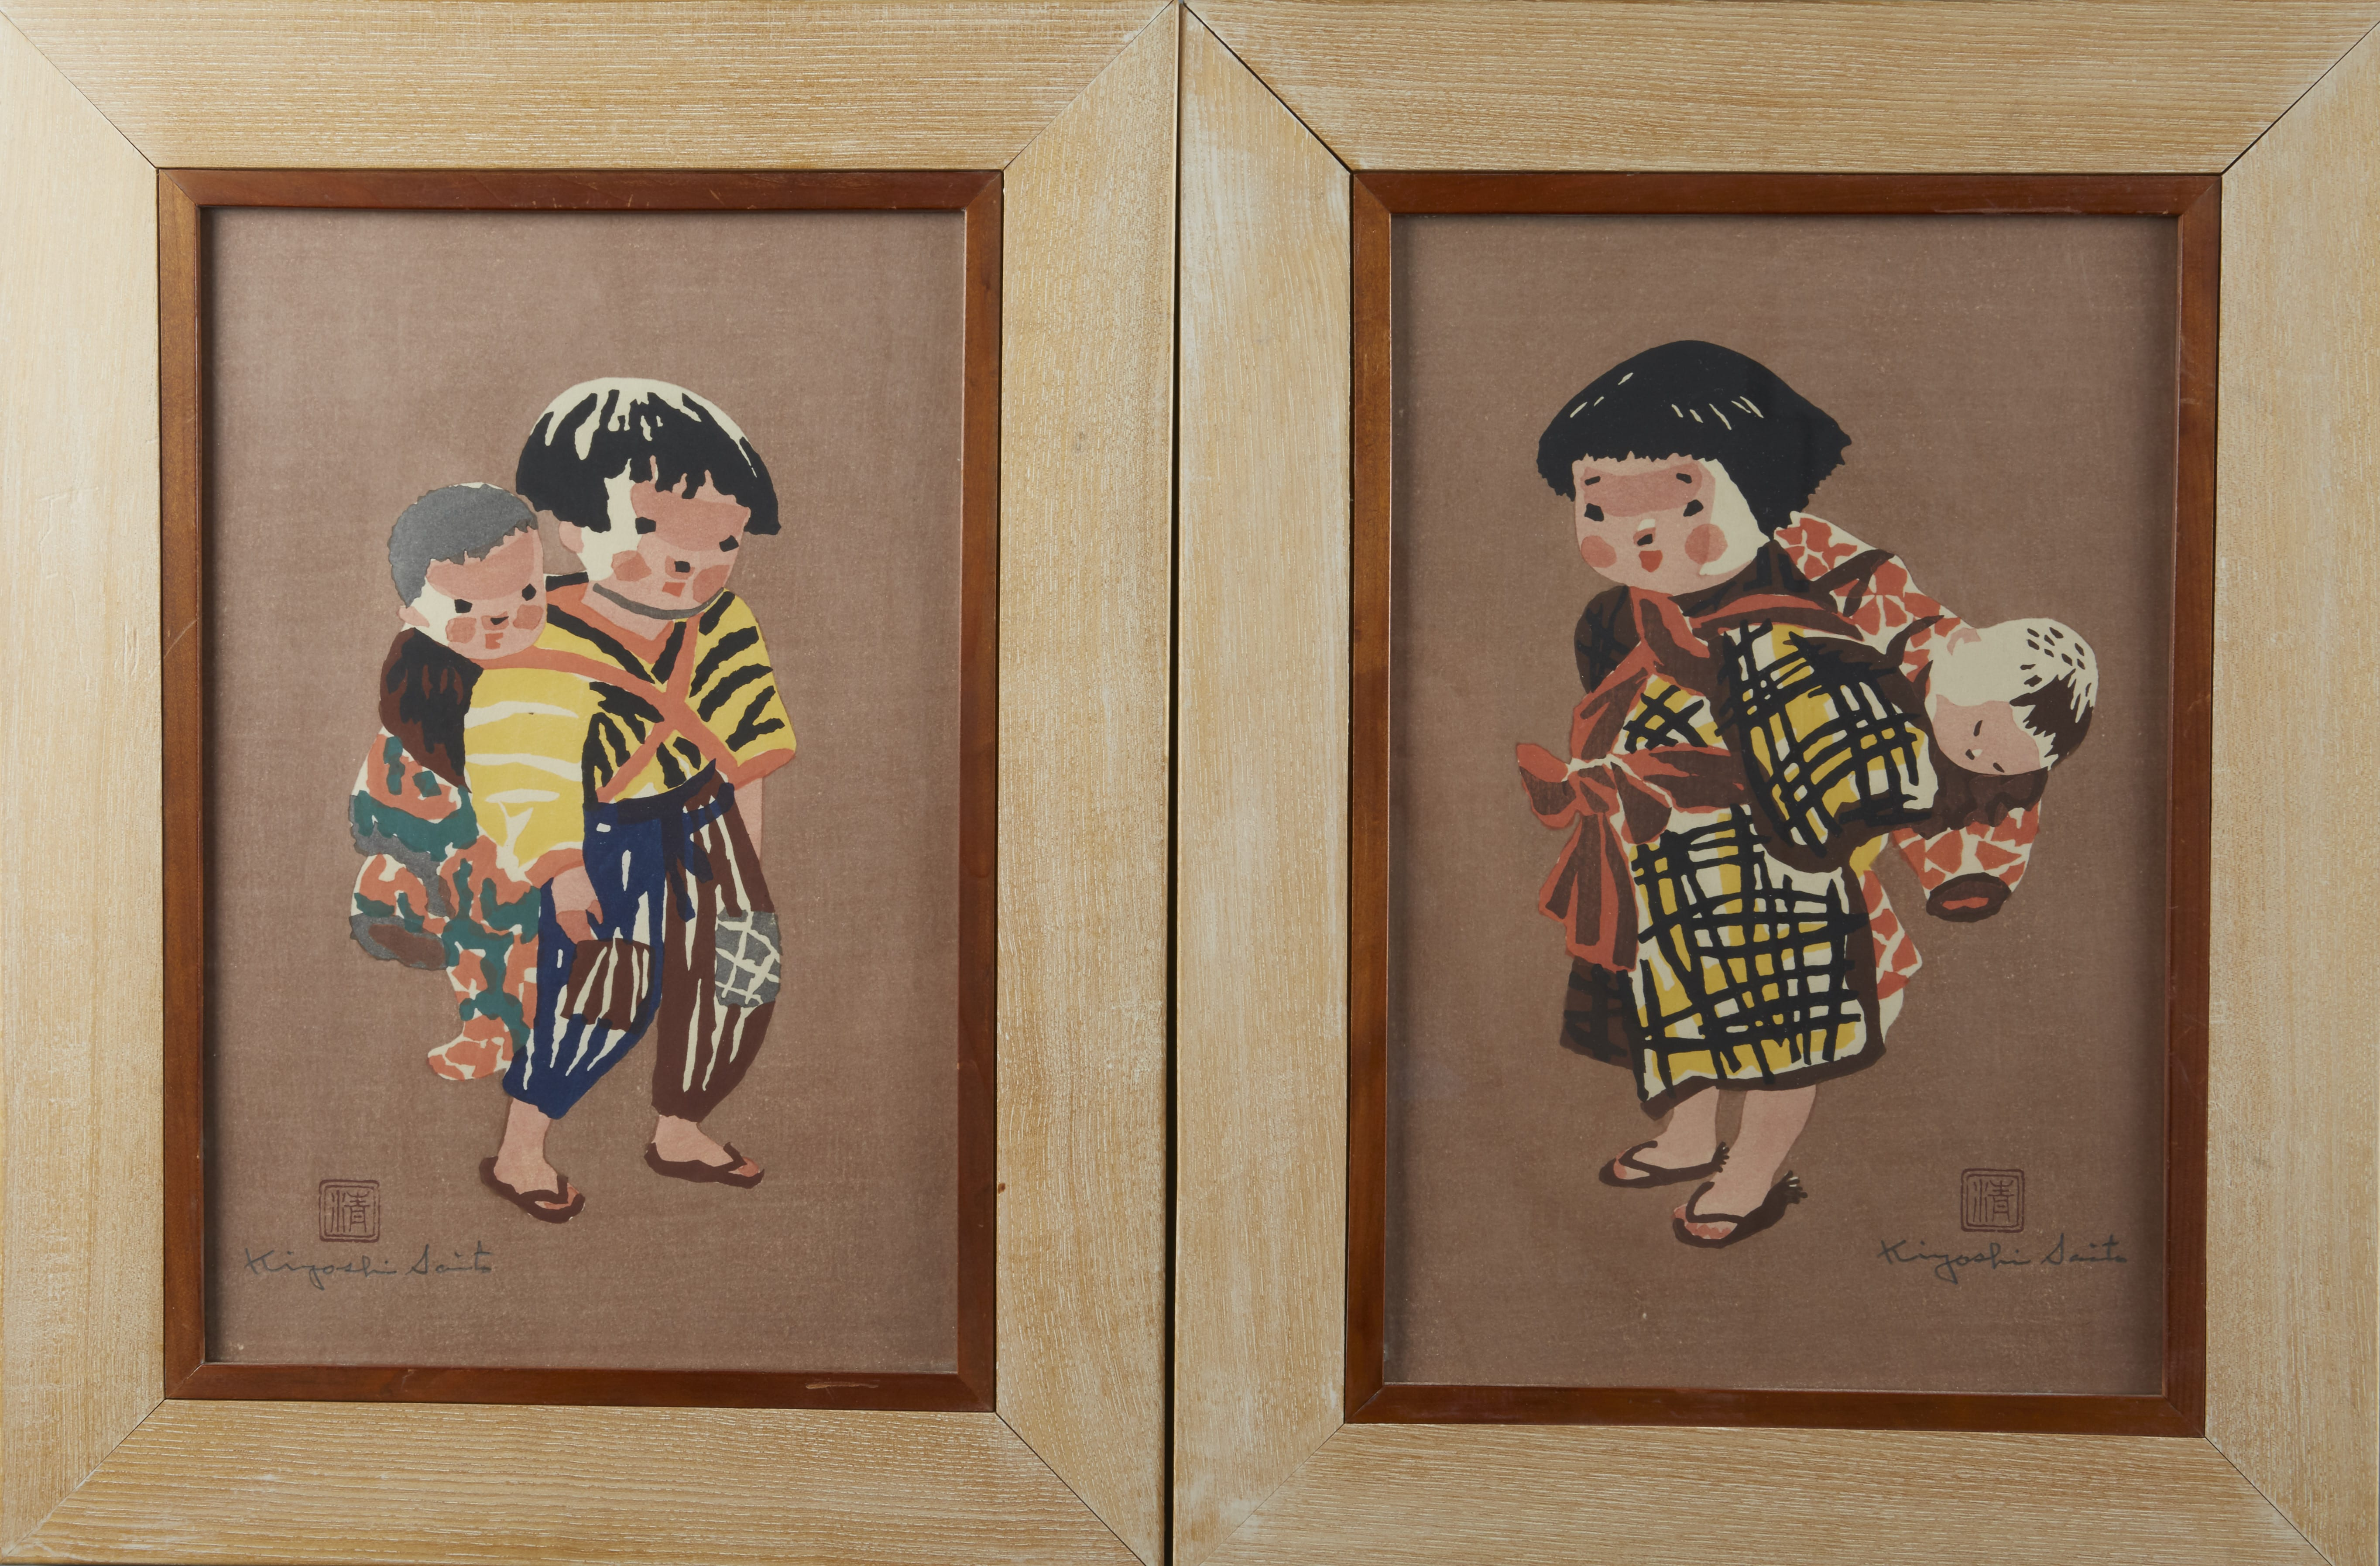 Lot 274: Pair of Kiyoshi Saito Woodblock Prints depicting Children